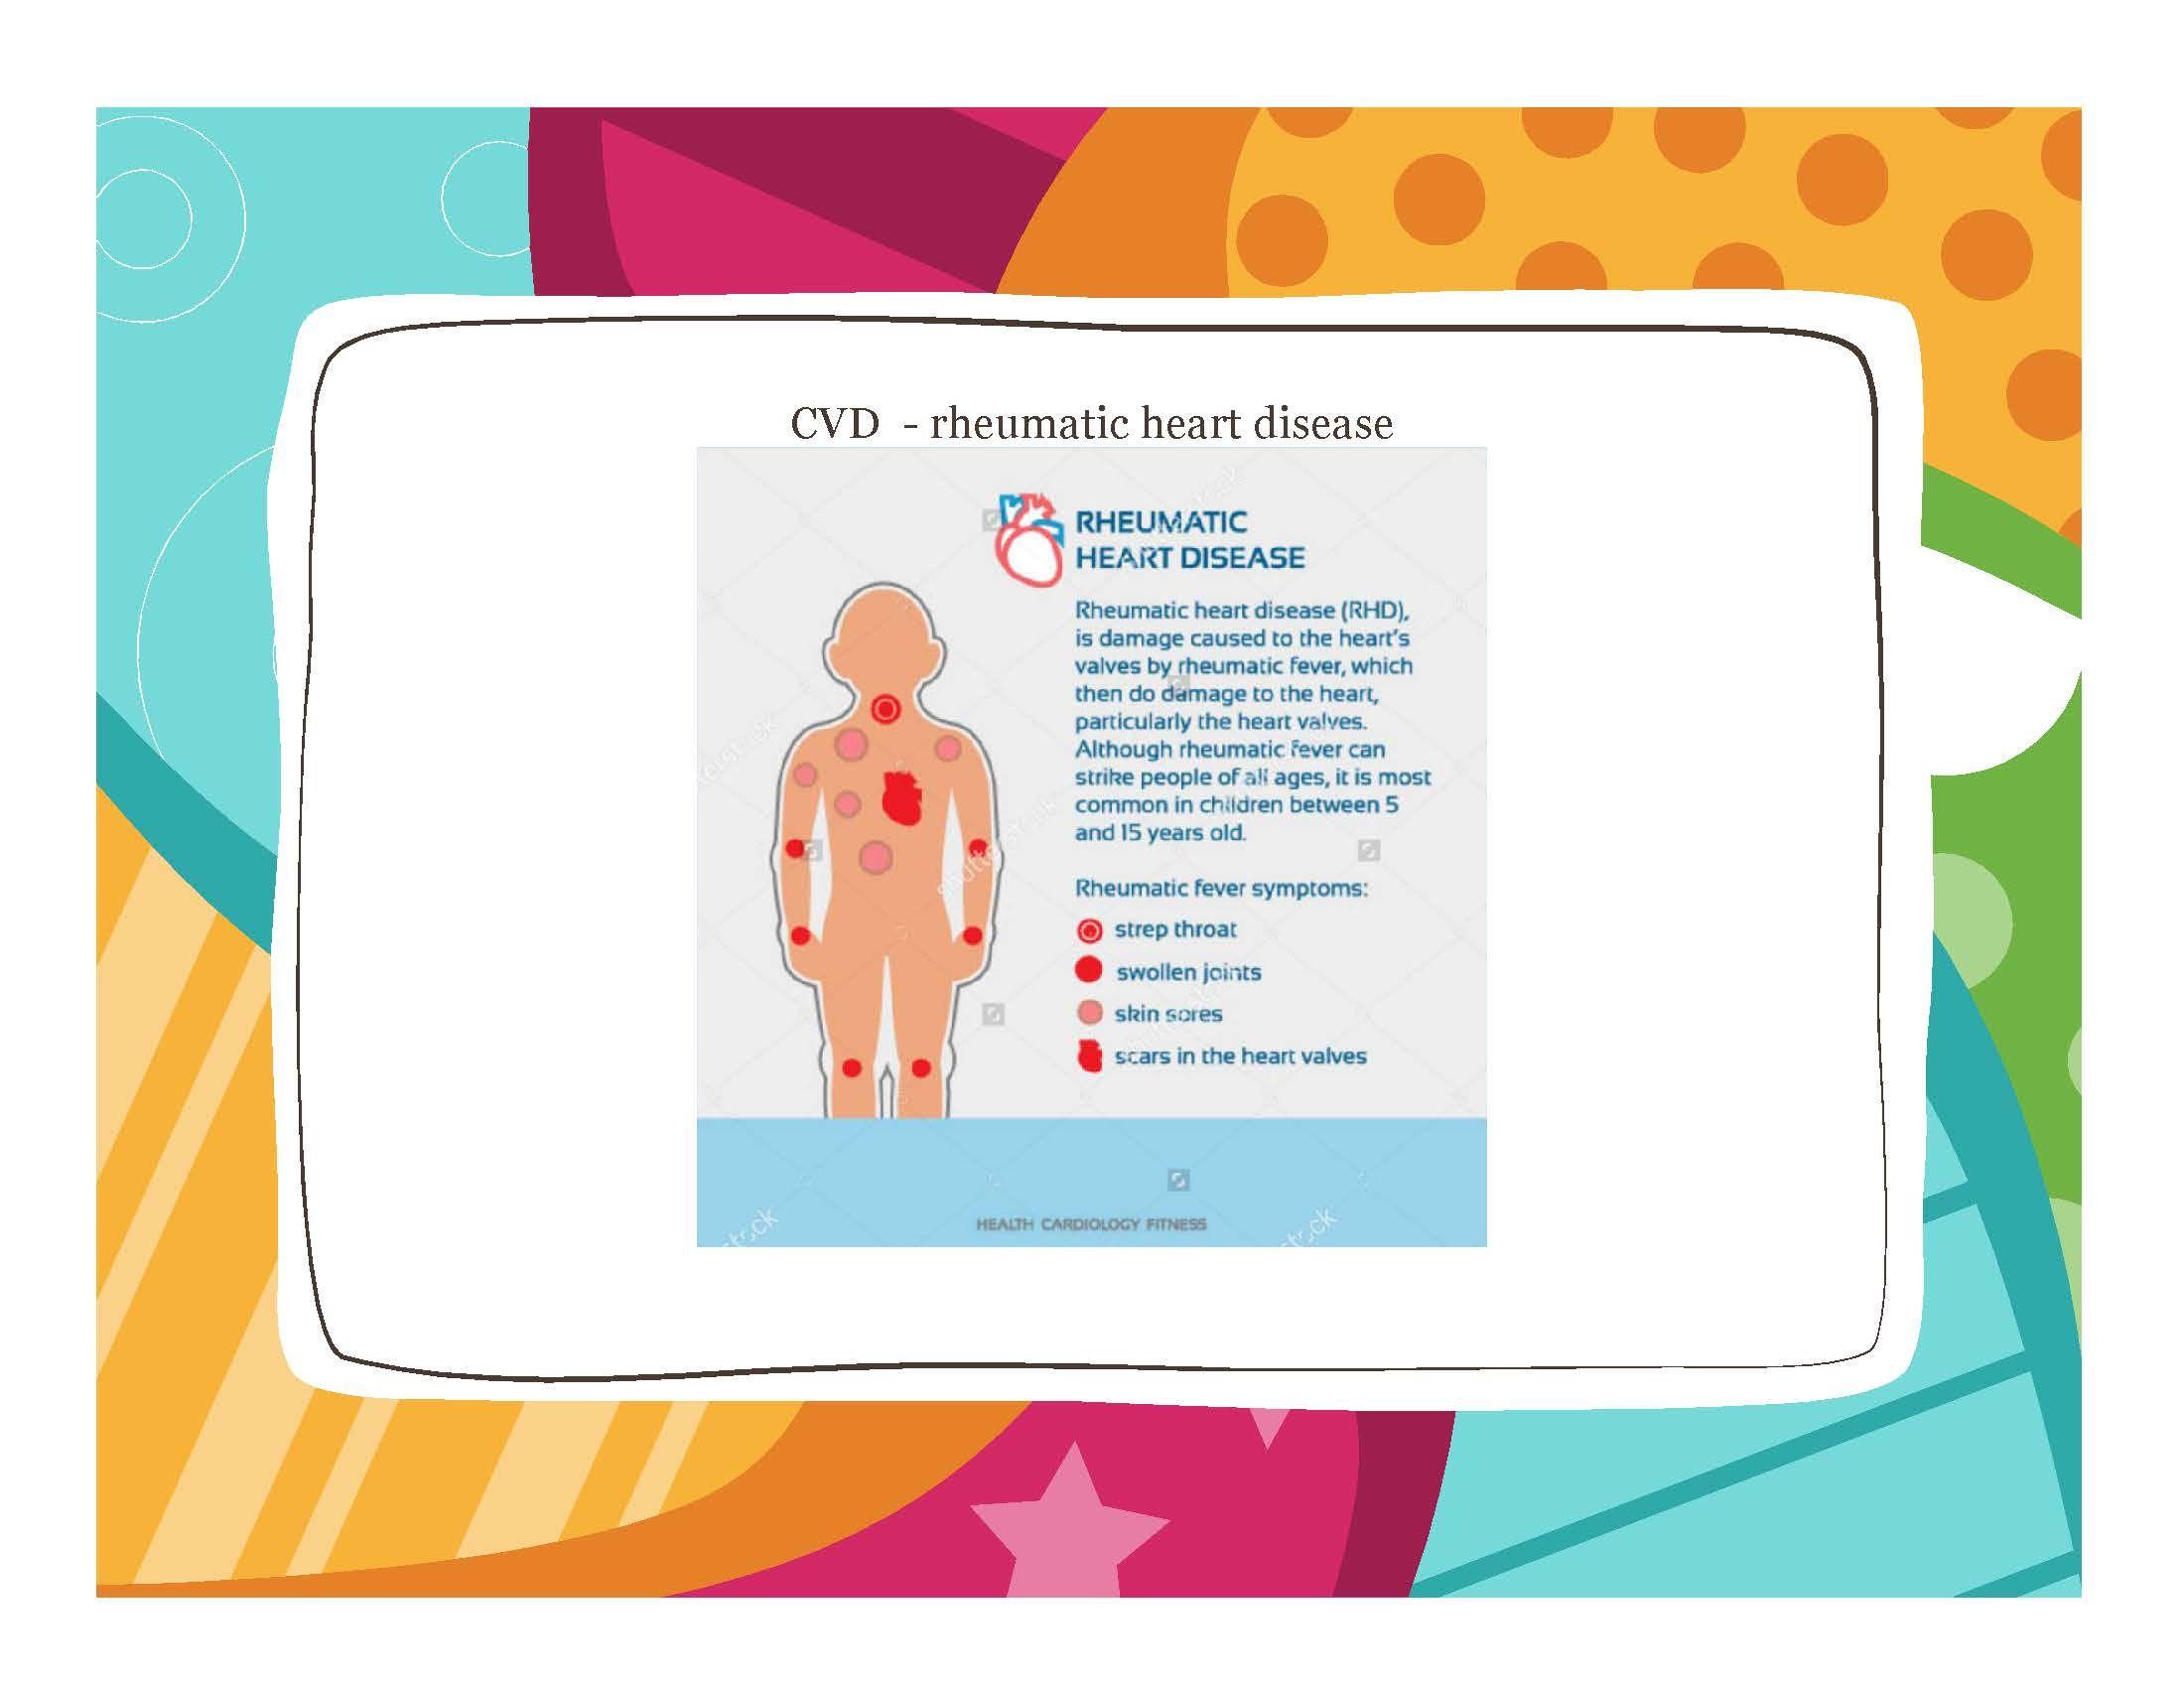 Cvd rheumatic heart disease did you know atsi children